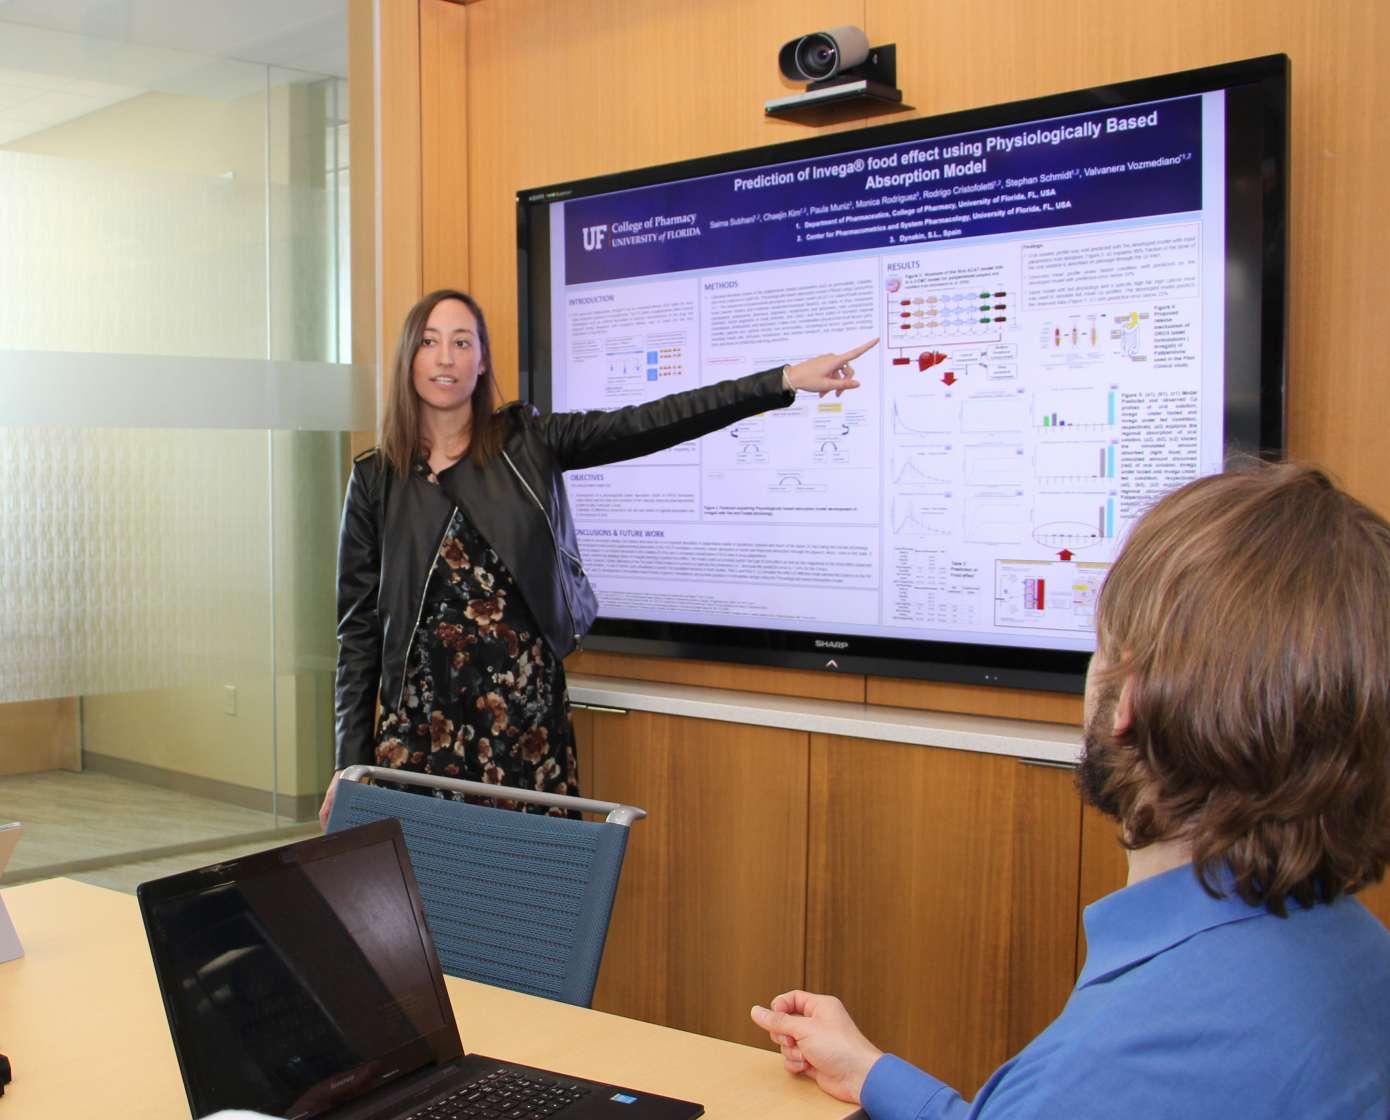 Dr. Valva Vozemediano presents data to her class.